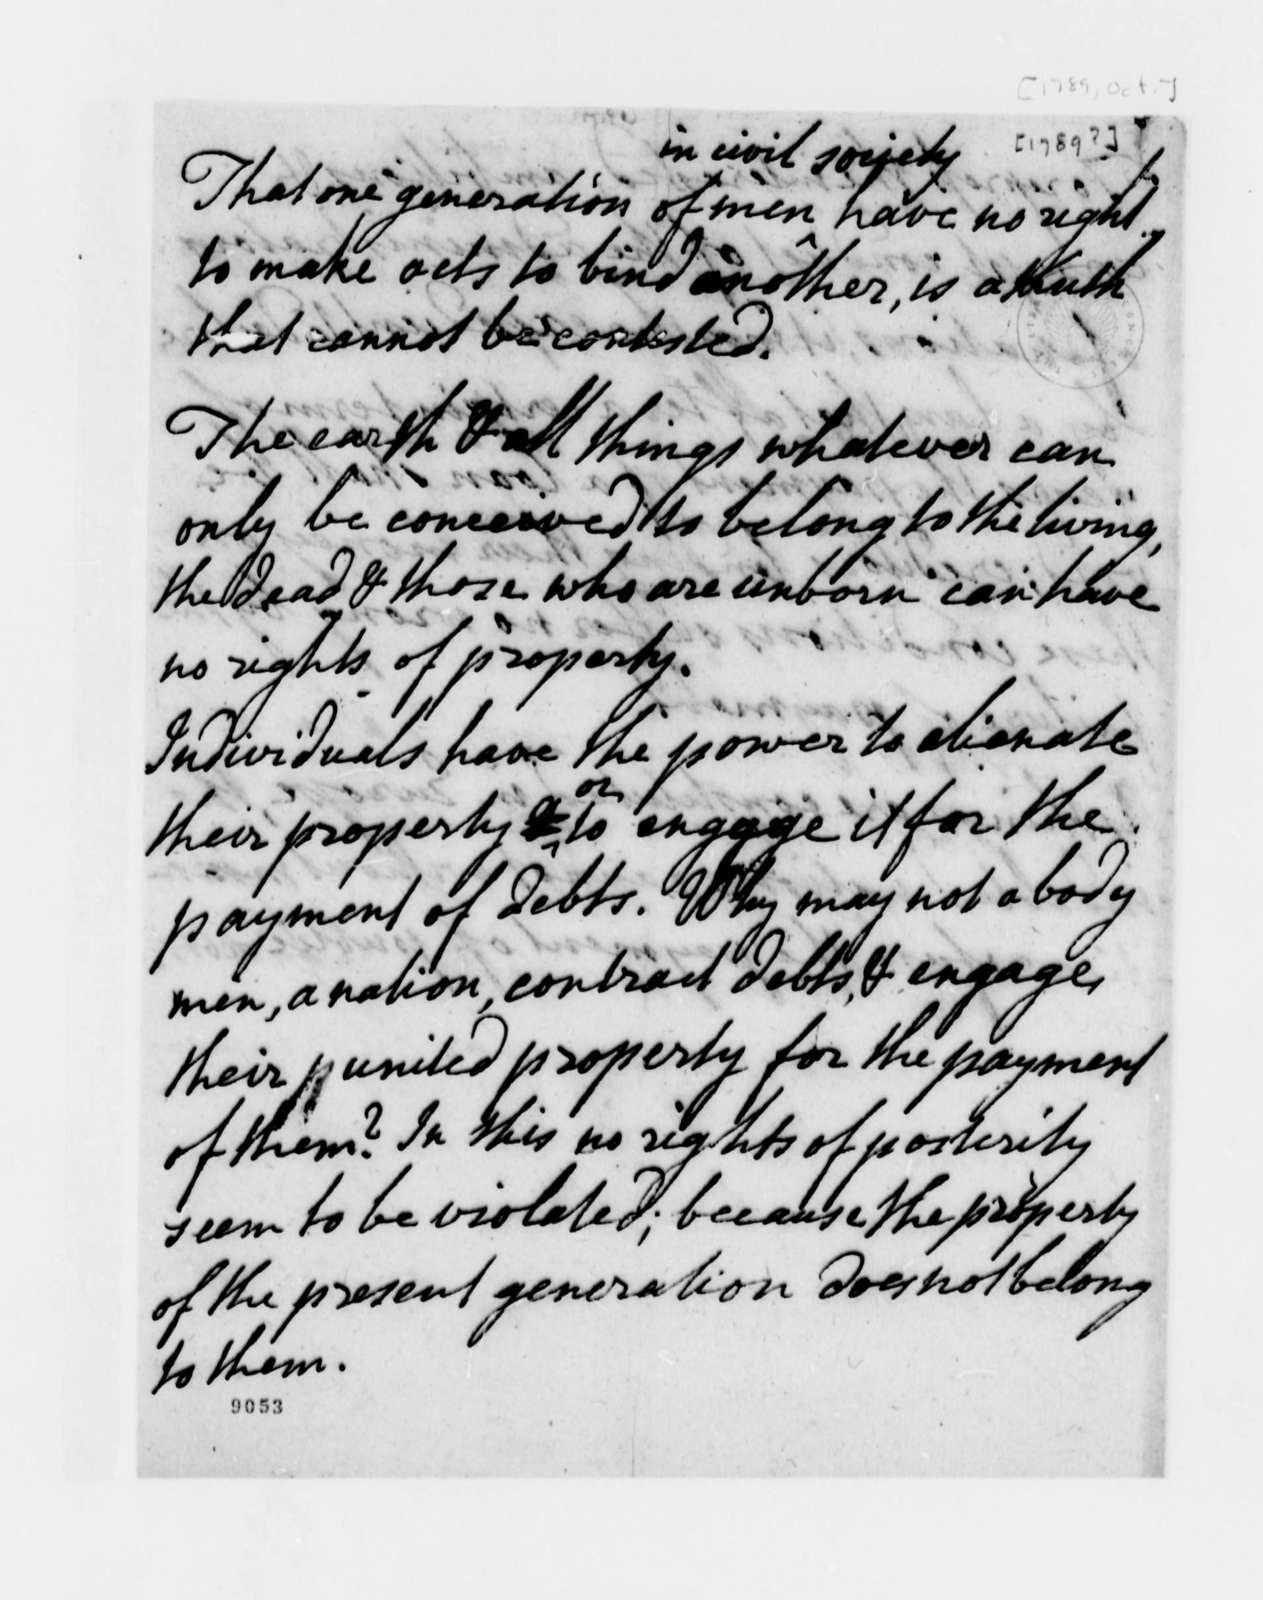 Richard Gem to Thomas Jefferson, October 1789